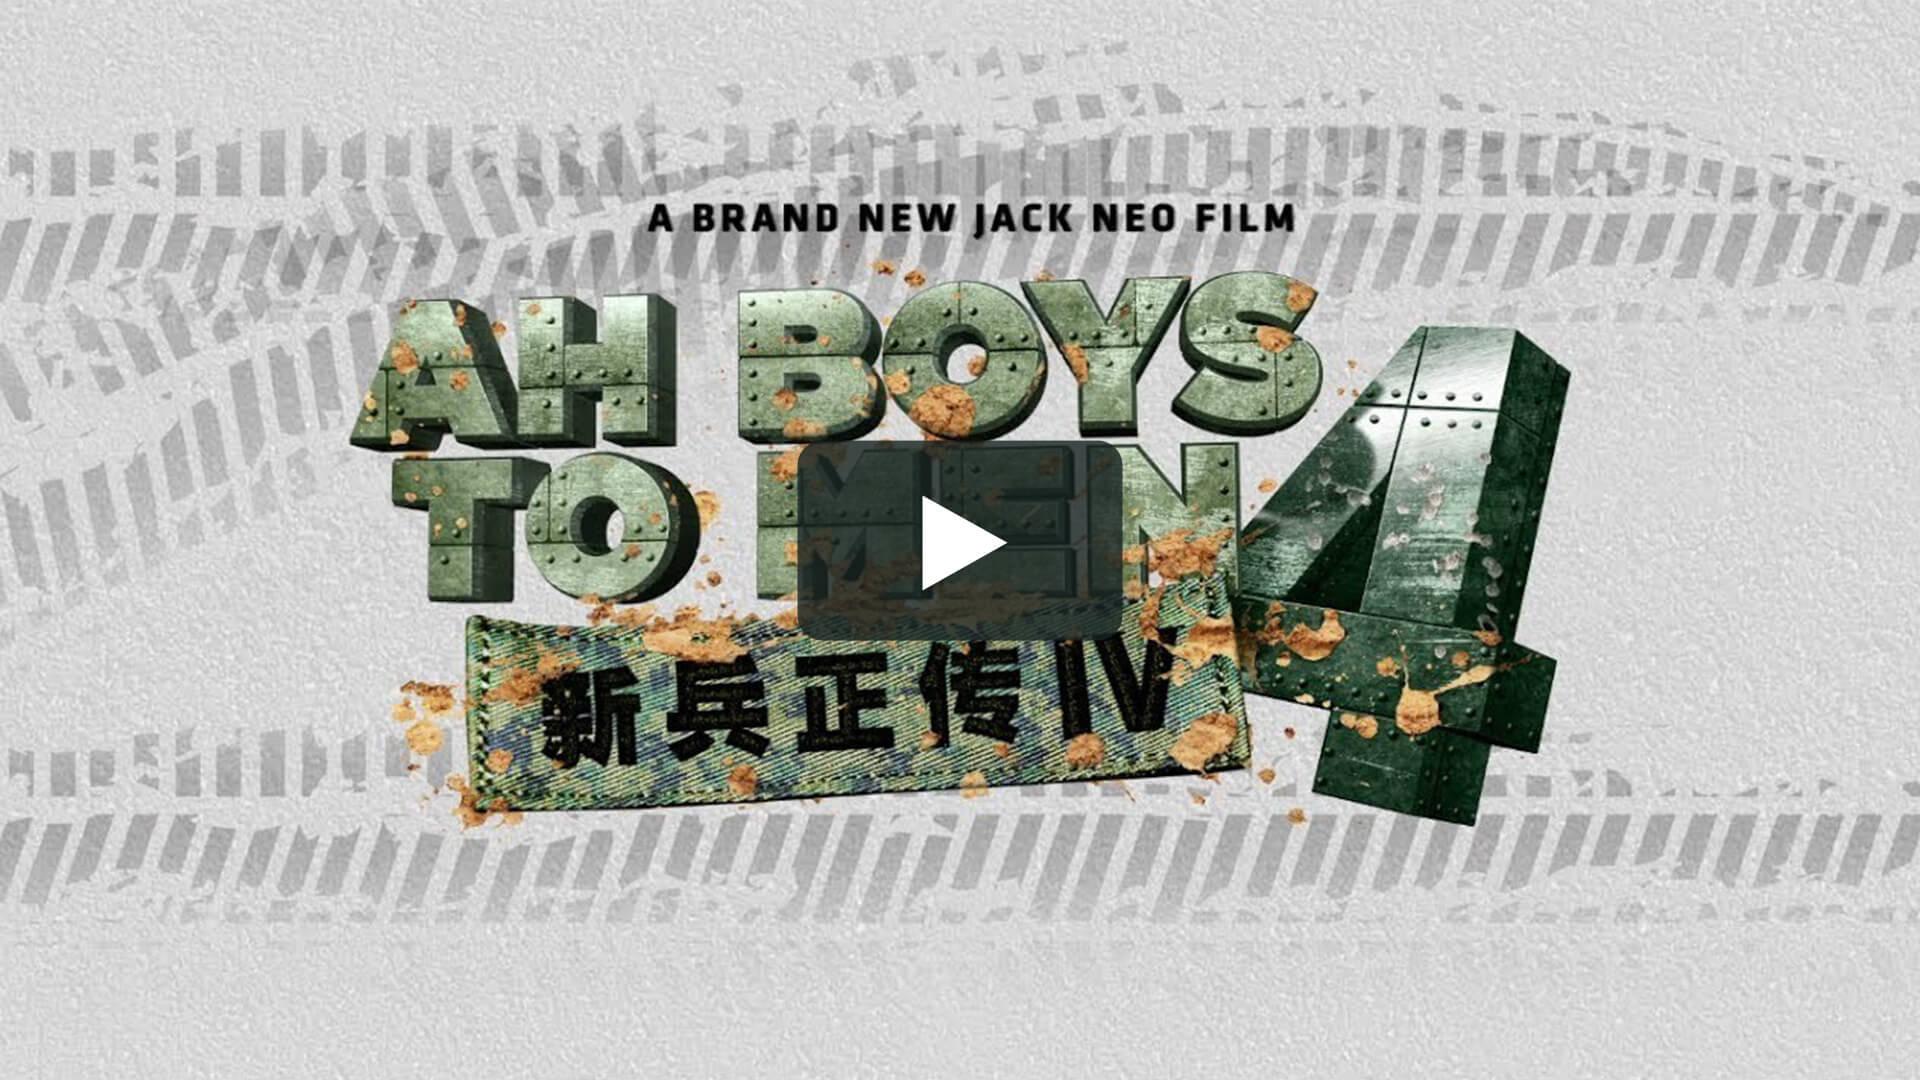 新兵正傳4 Ah Boys To Men 4